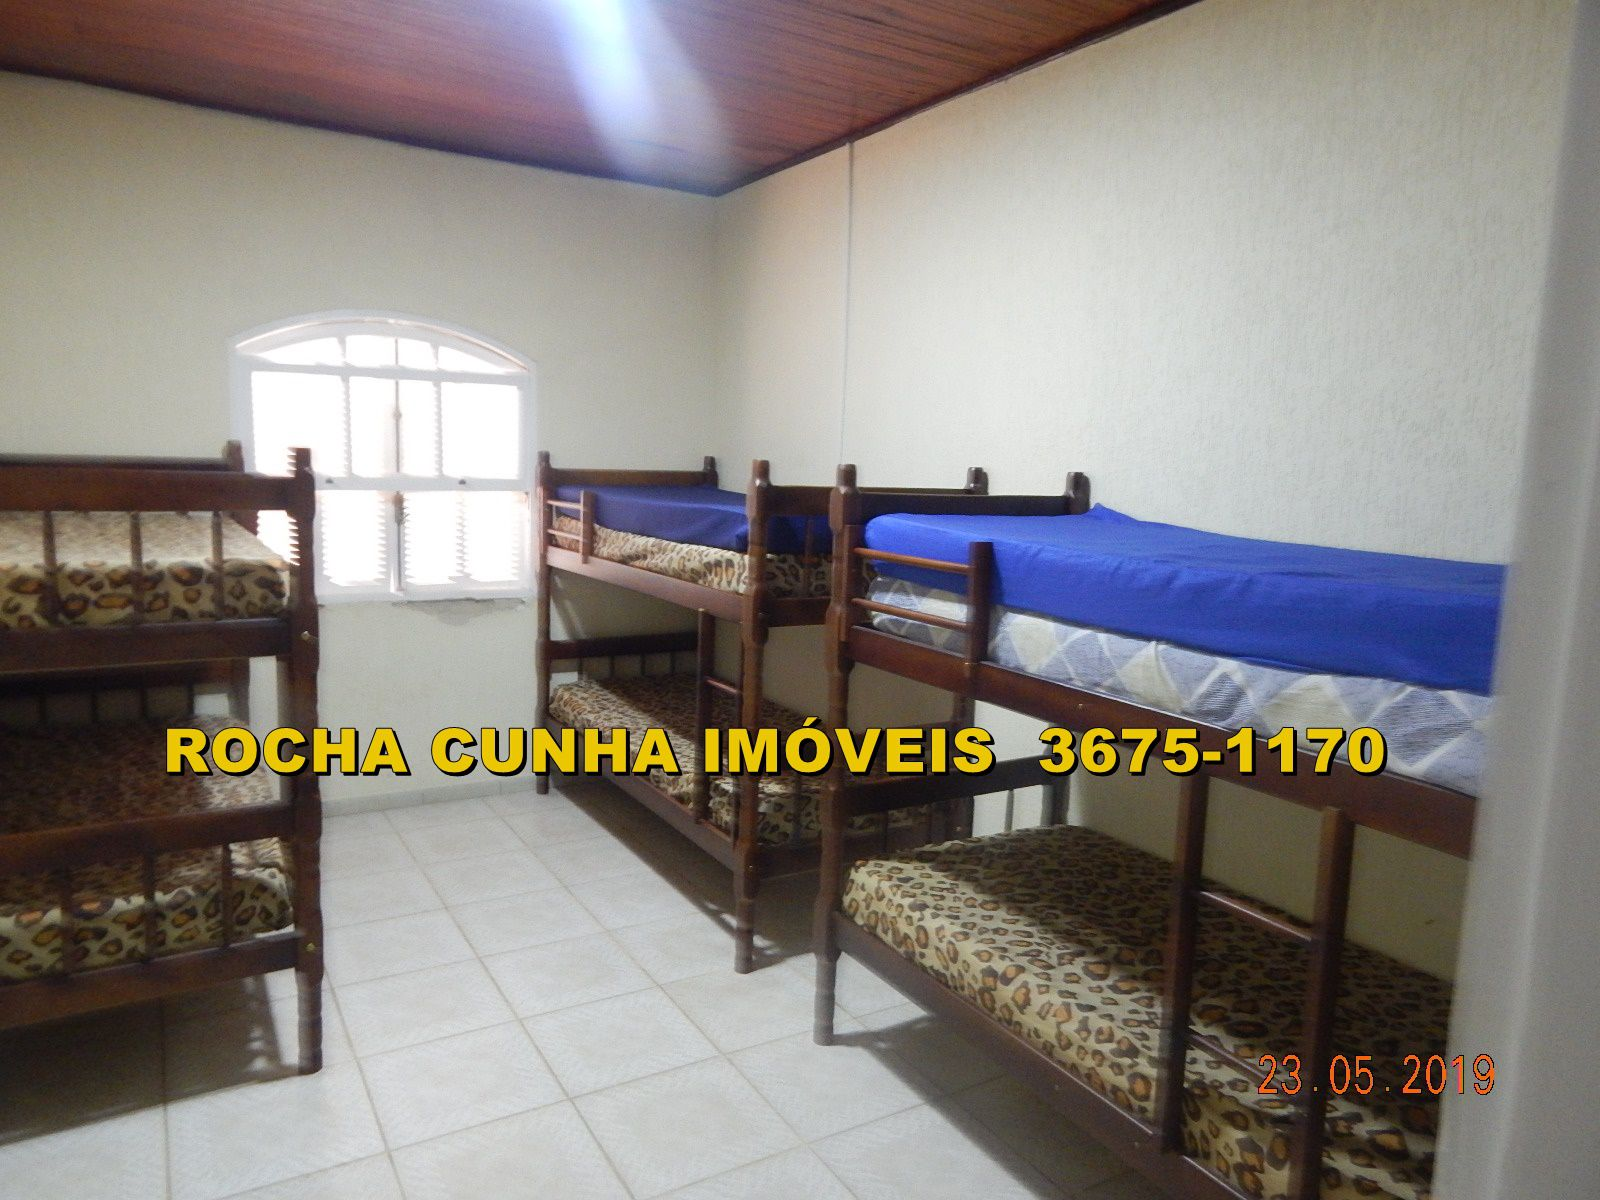 Chácara à venda Santana de Parnaíba,SP - R$ 780.000 - CHACARA0010 - 25